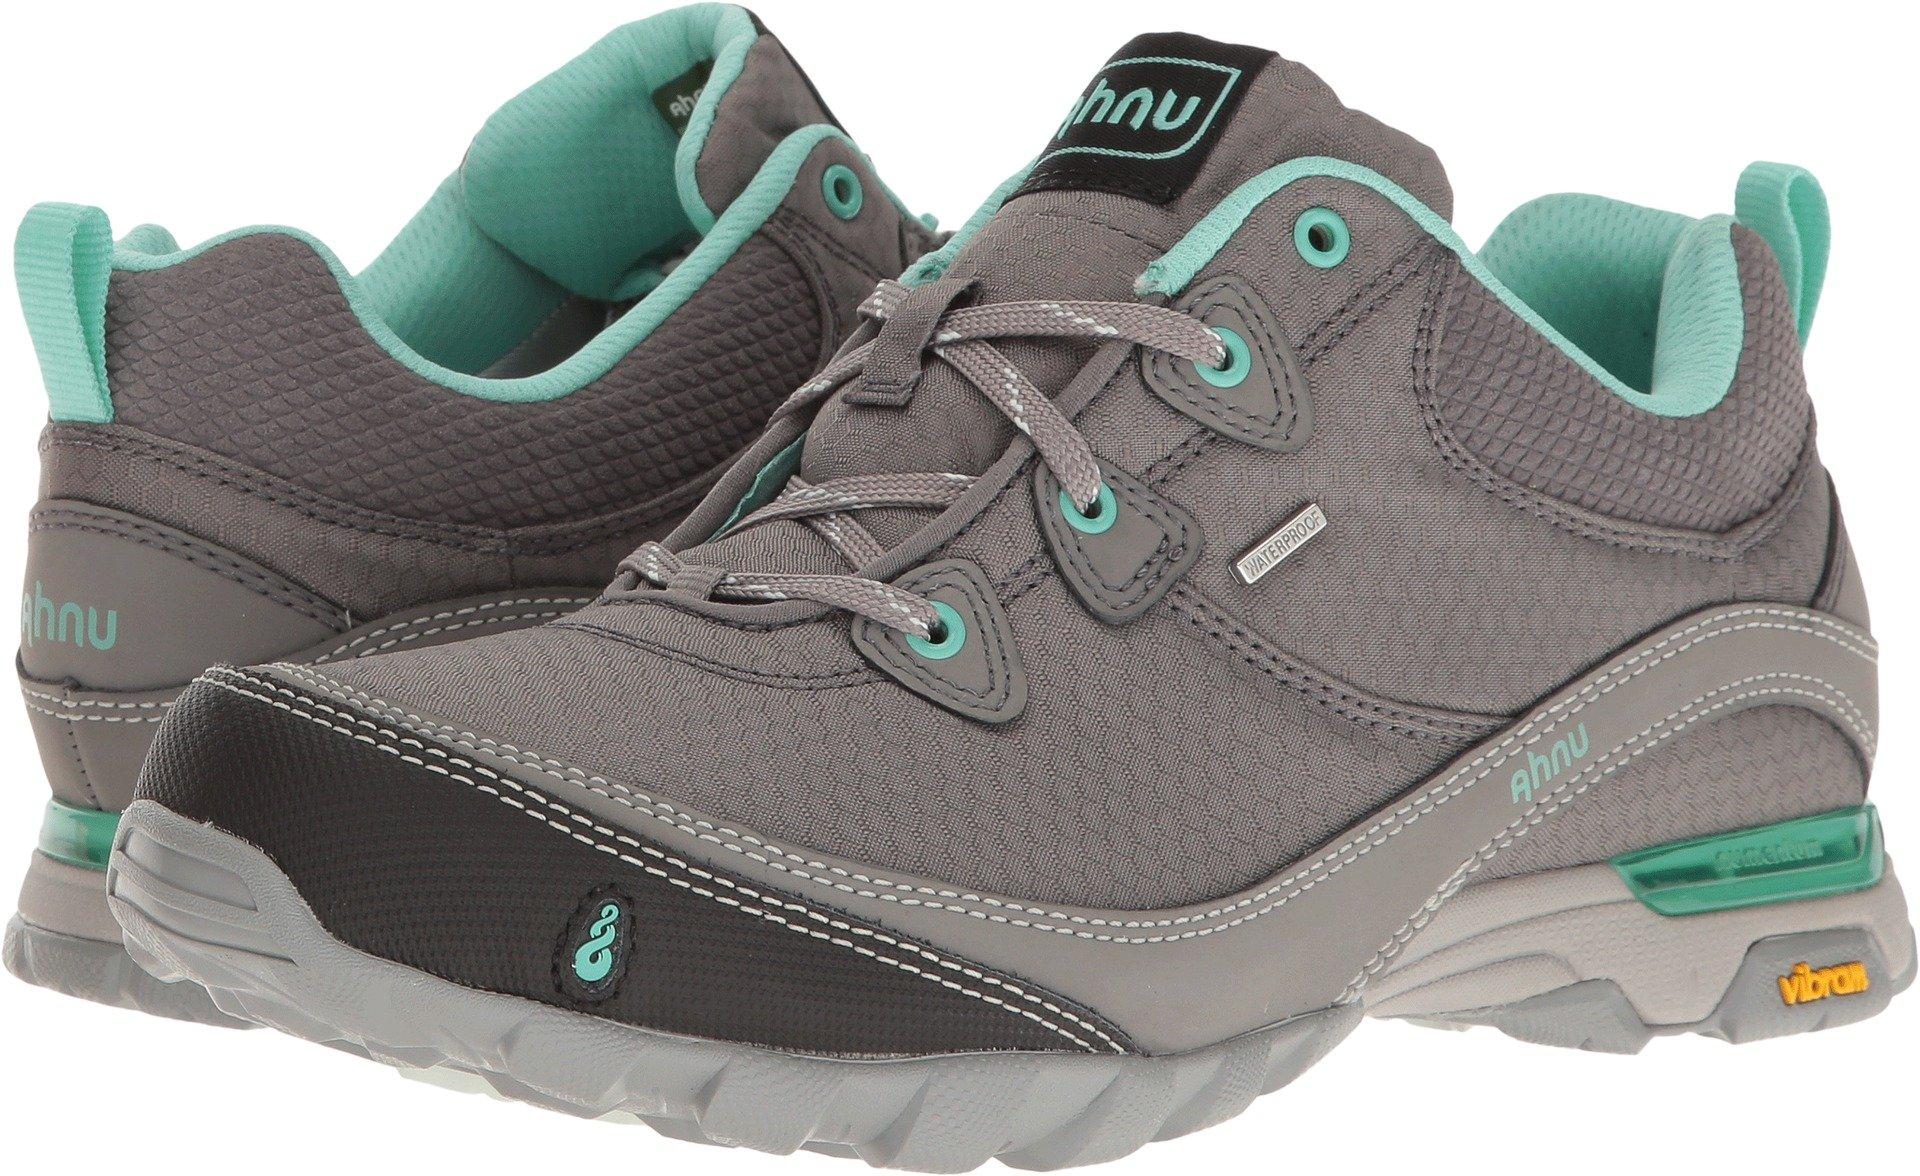 Ahnu Women's W Sugarpine Waterproof Hiking Shoe, New Dark Grey, 7 M US